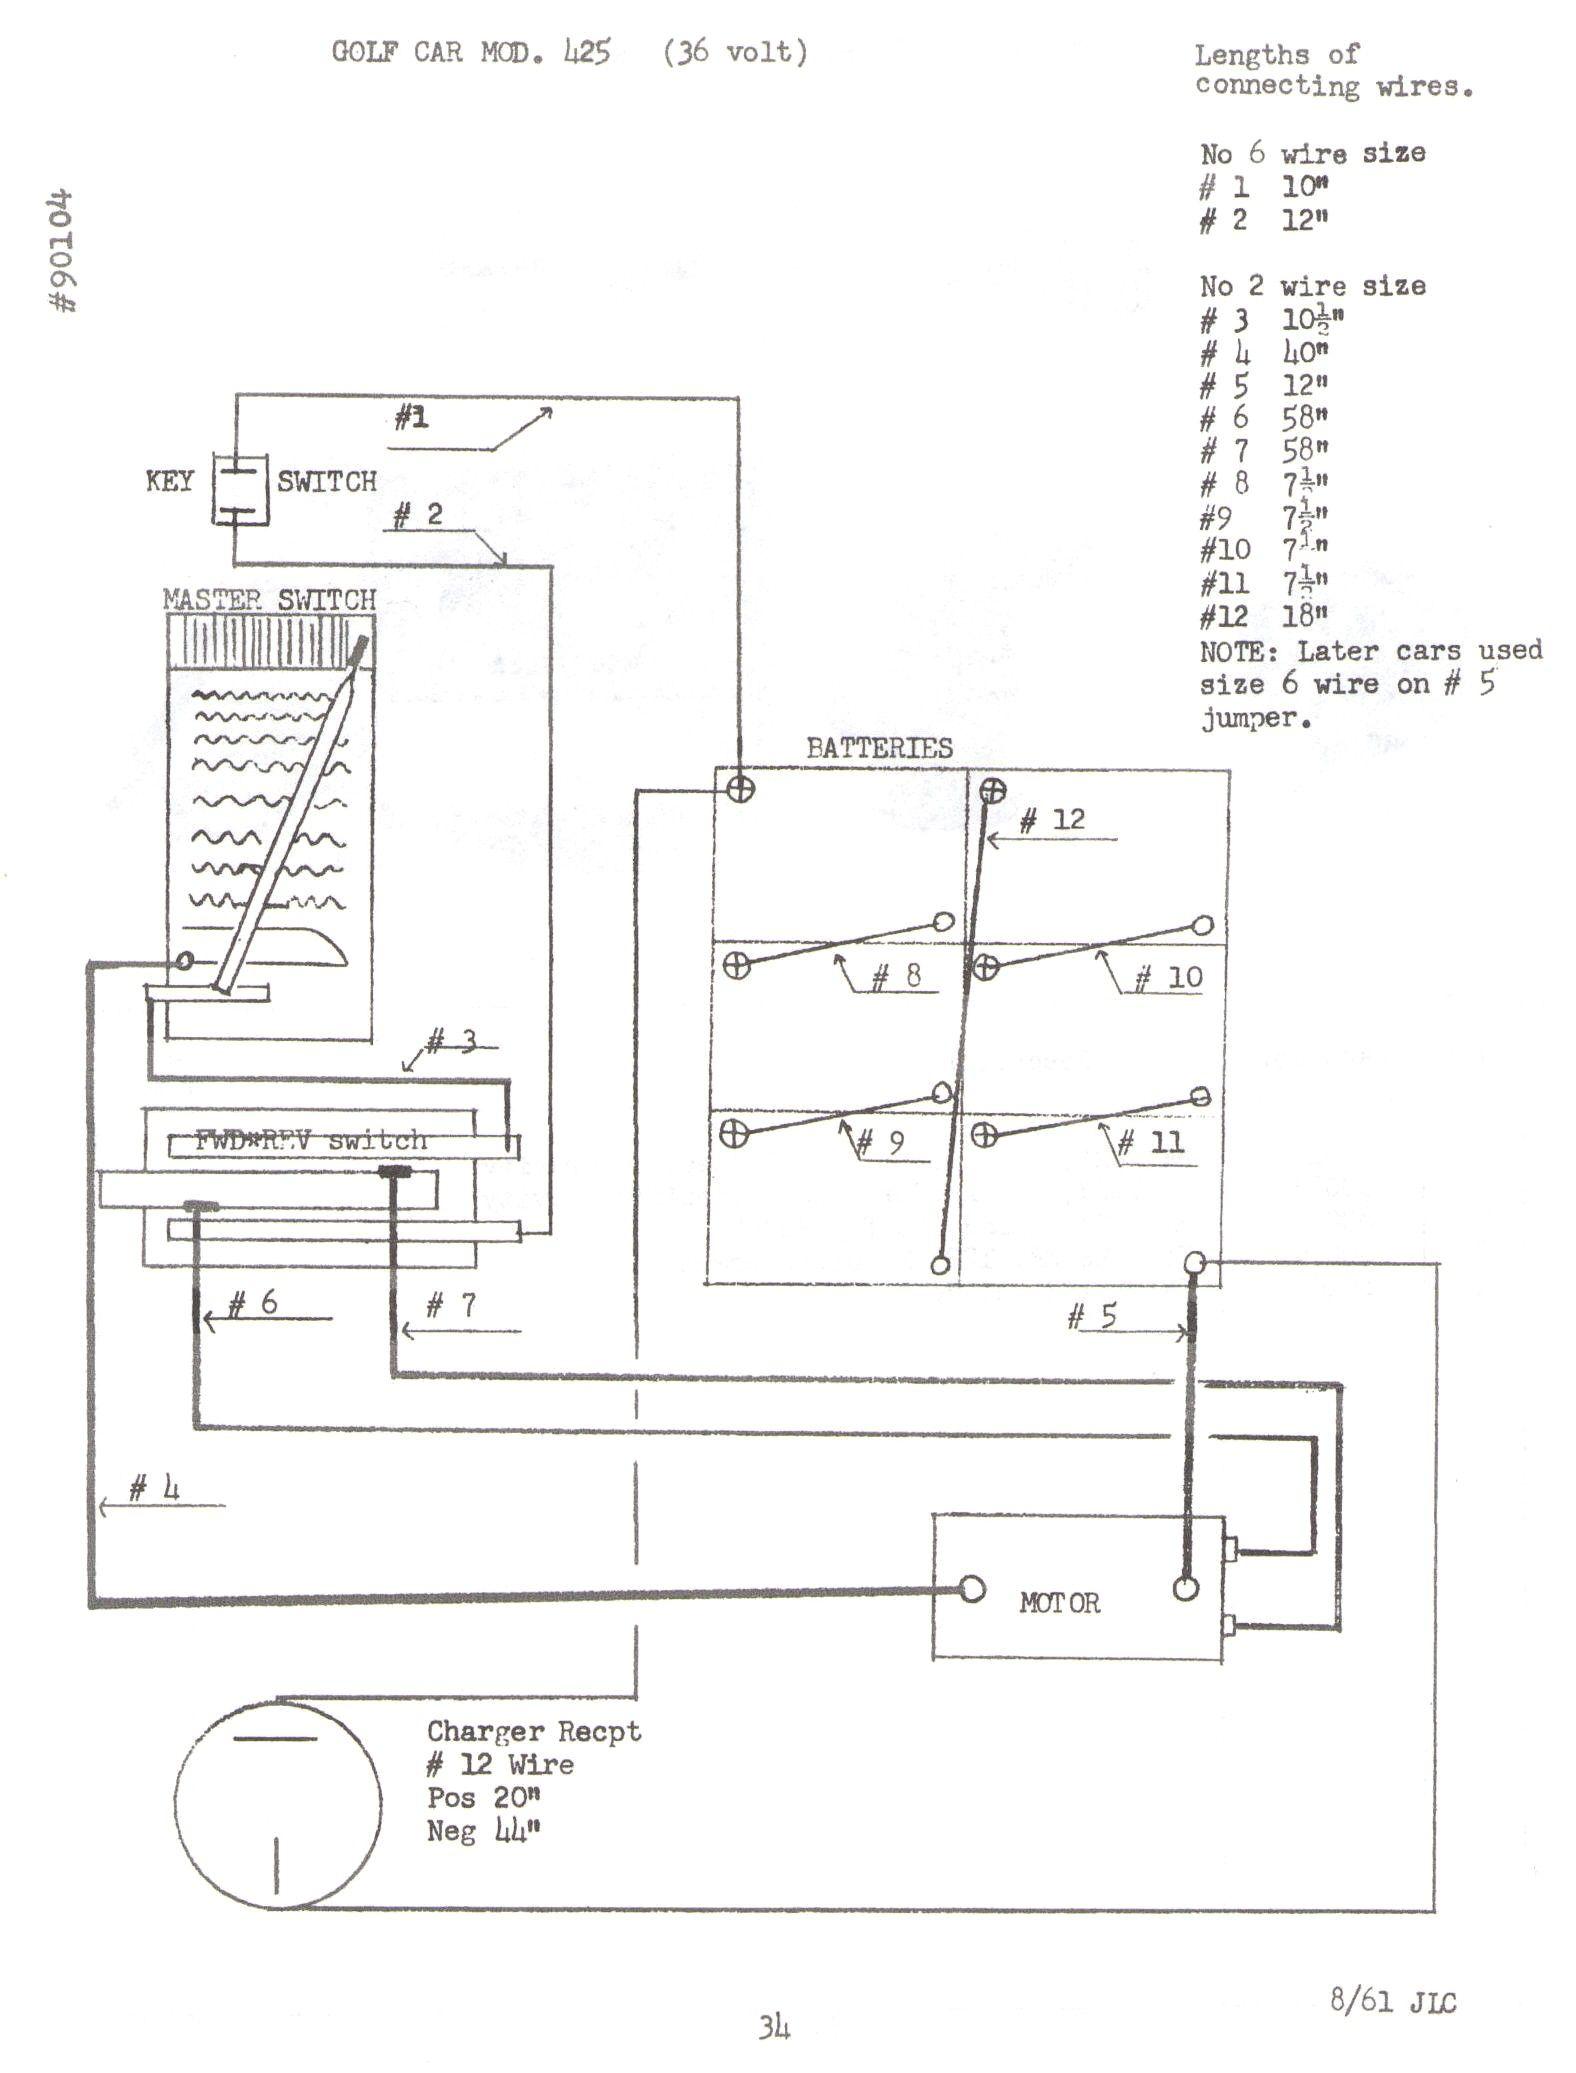 Westinghouse Desk Fan Wiring Diagram Wiring Diagram H5 In 2020 Ceiling Fan Wiring Westinghouse Latest Cars